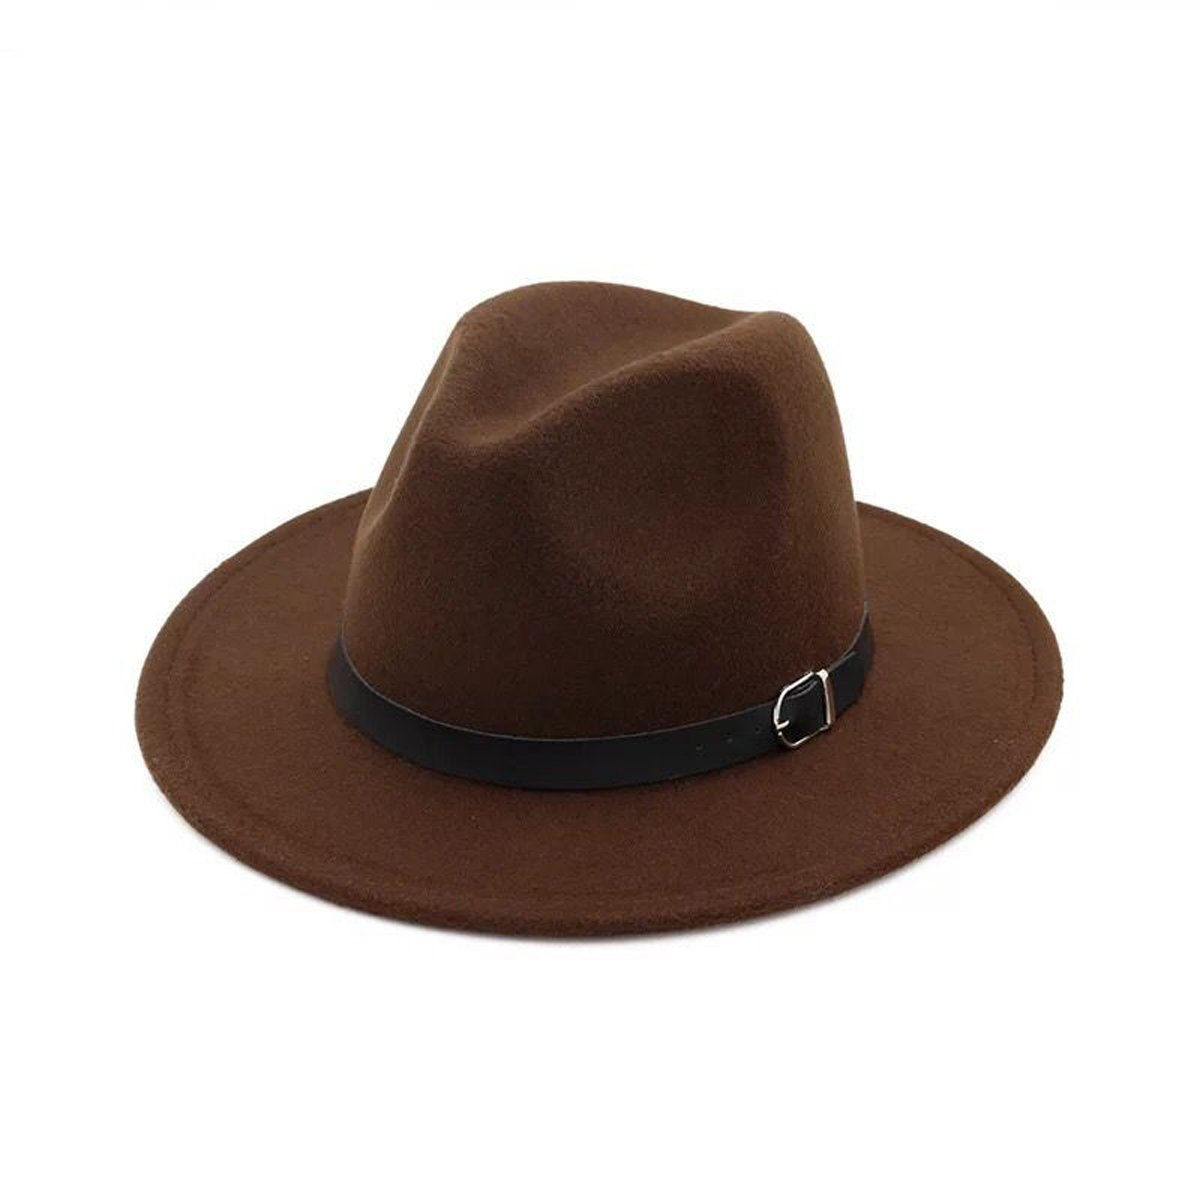 5927980b043 Lanzom Women Retro Style Wide Brim Panama Hat Belt Buckle Wool Fedora Hat  product image